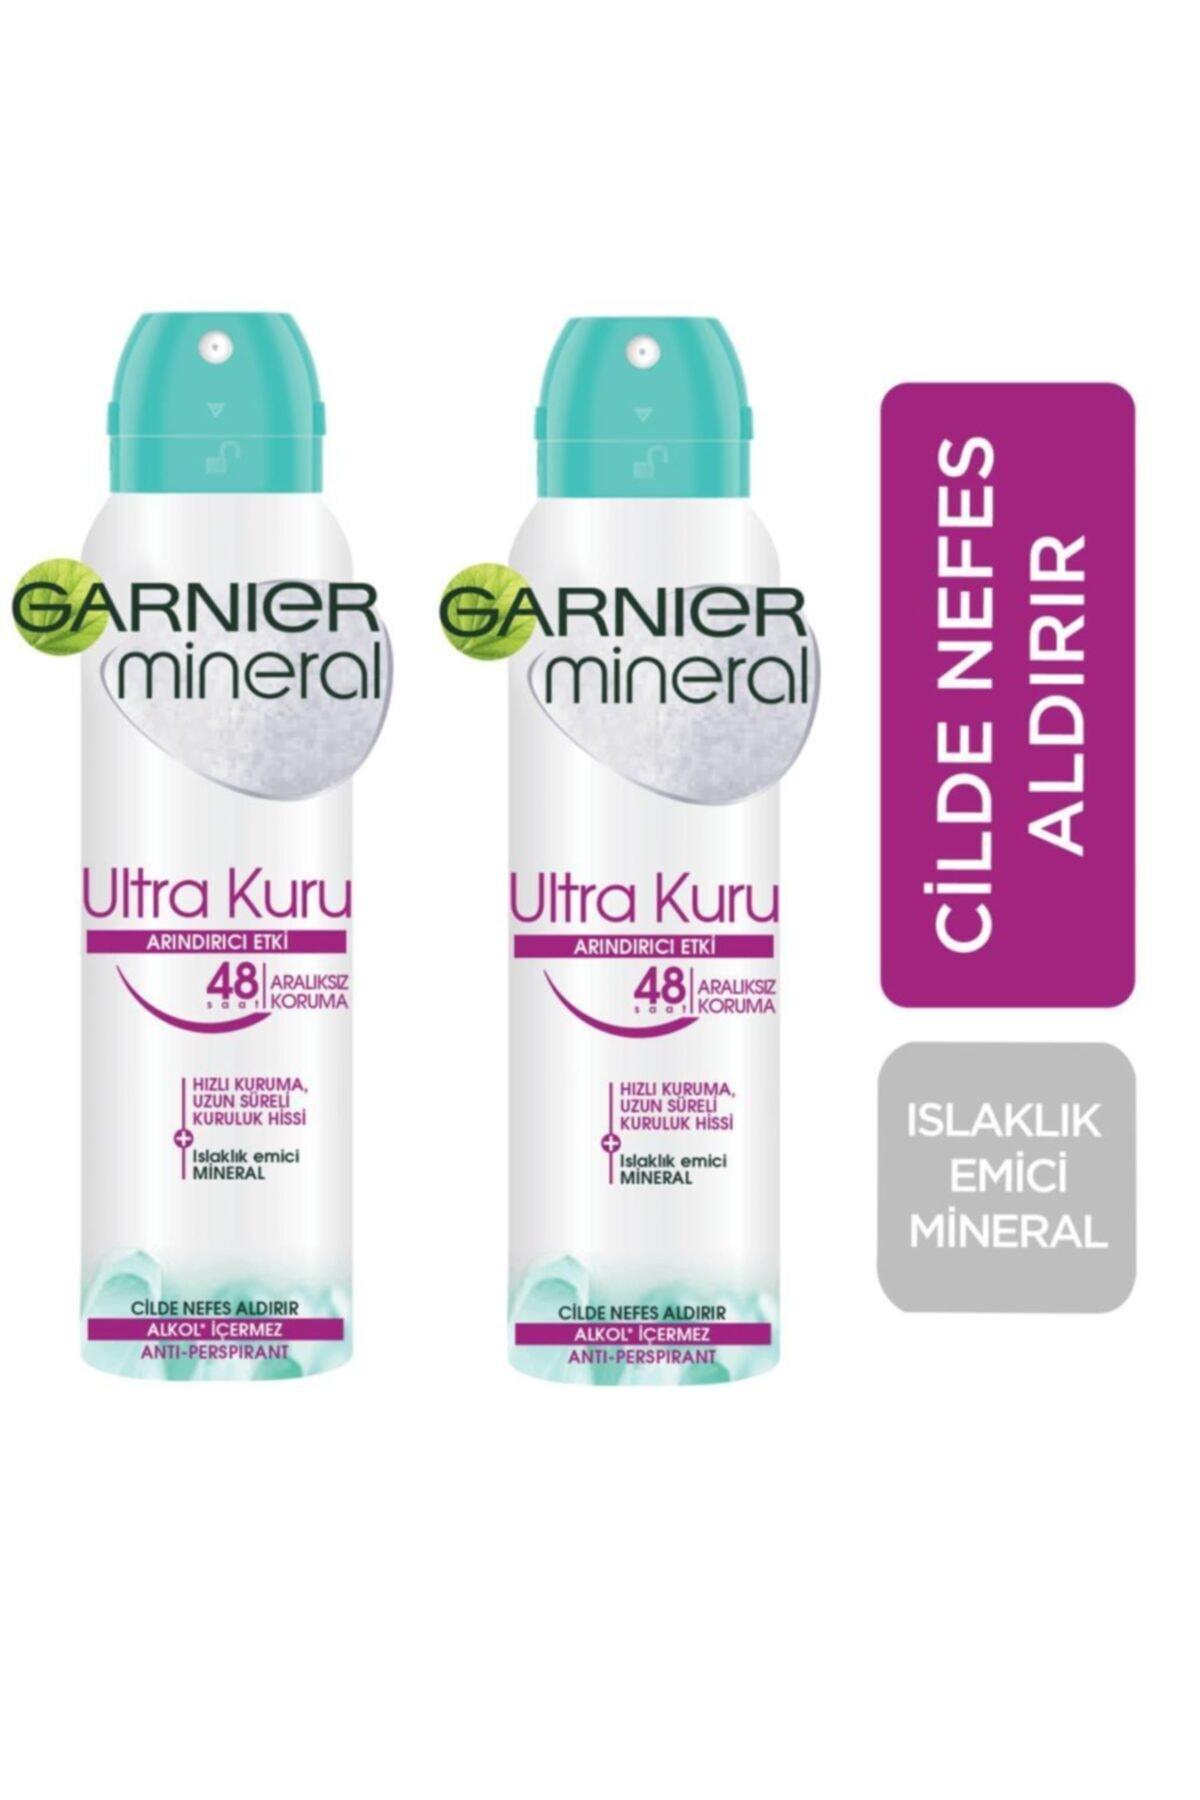 Garnier Mineral Ultra Kuru Kadın Sprey Deodorant 150 Ml 2 Adet 1